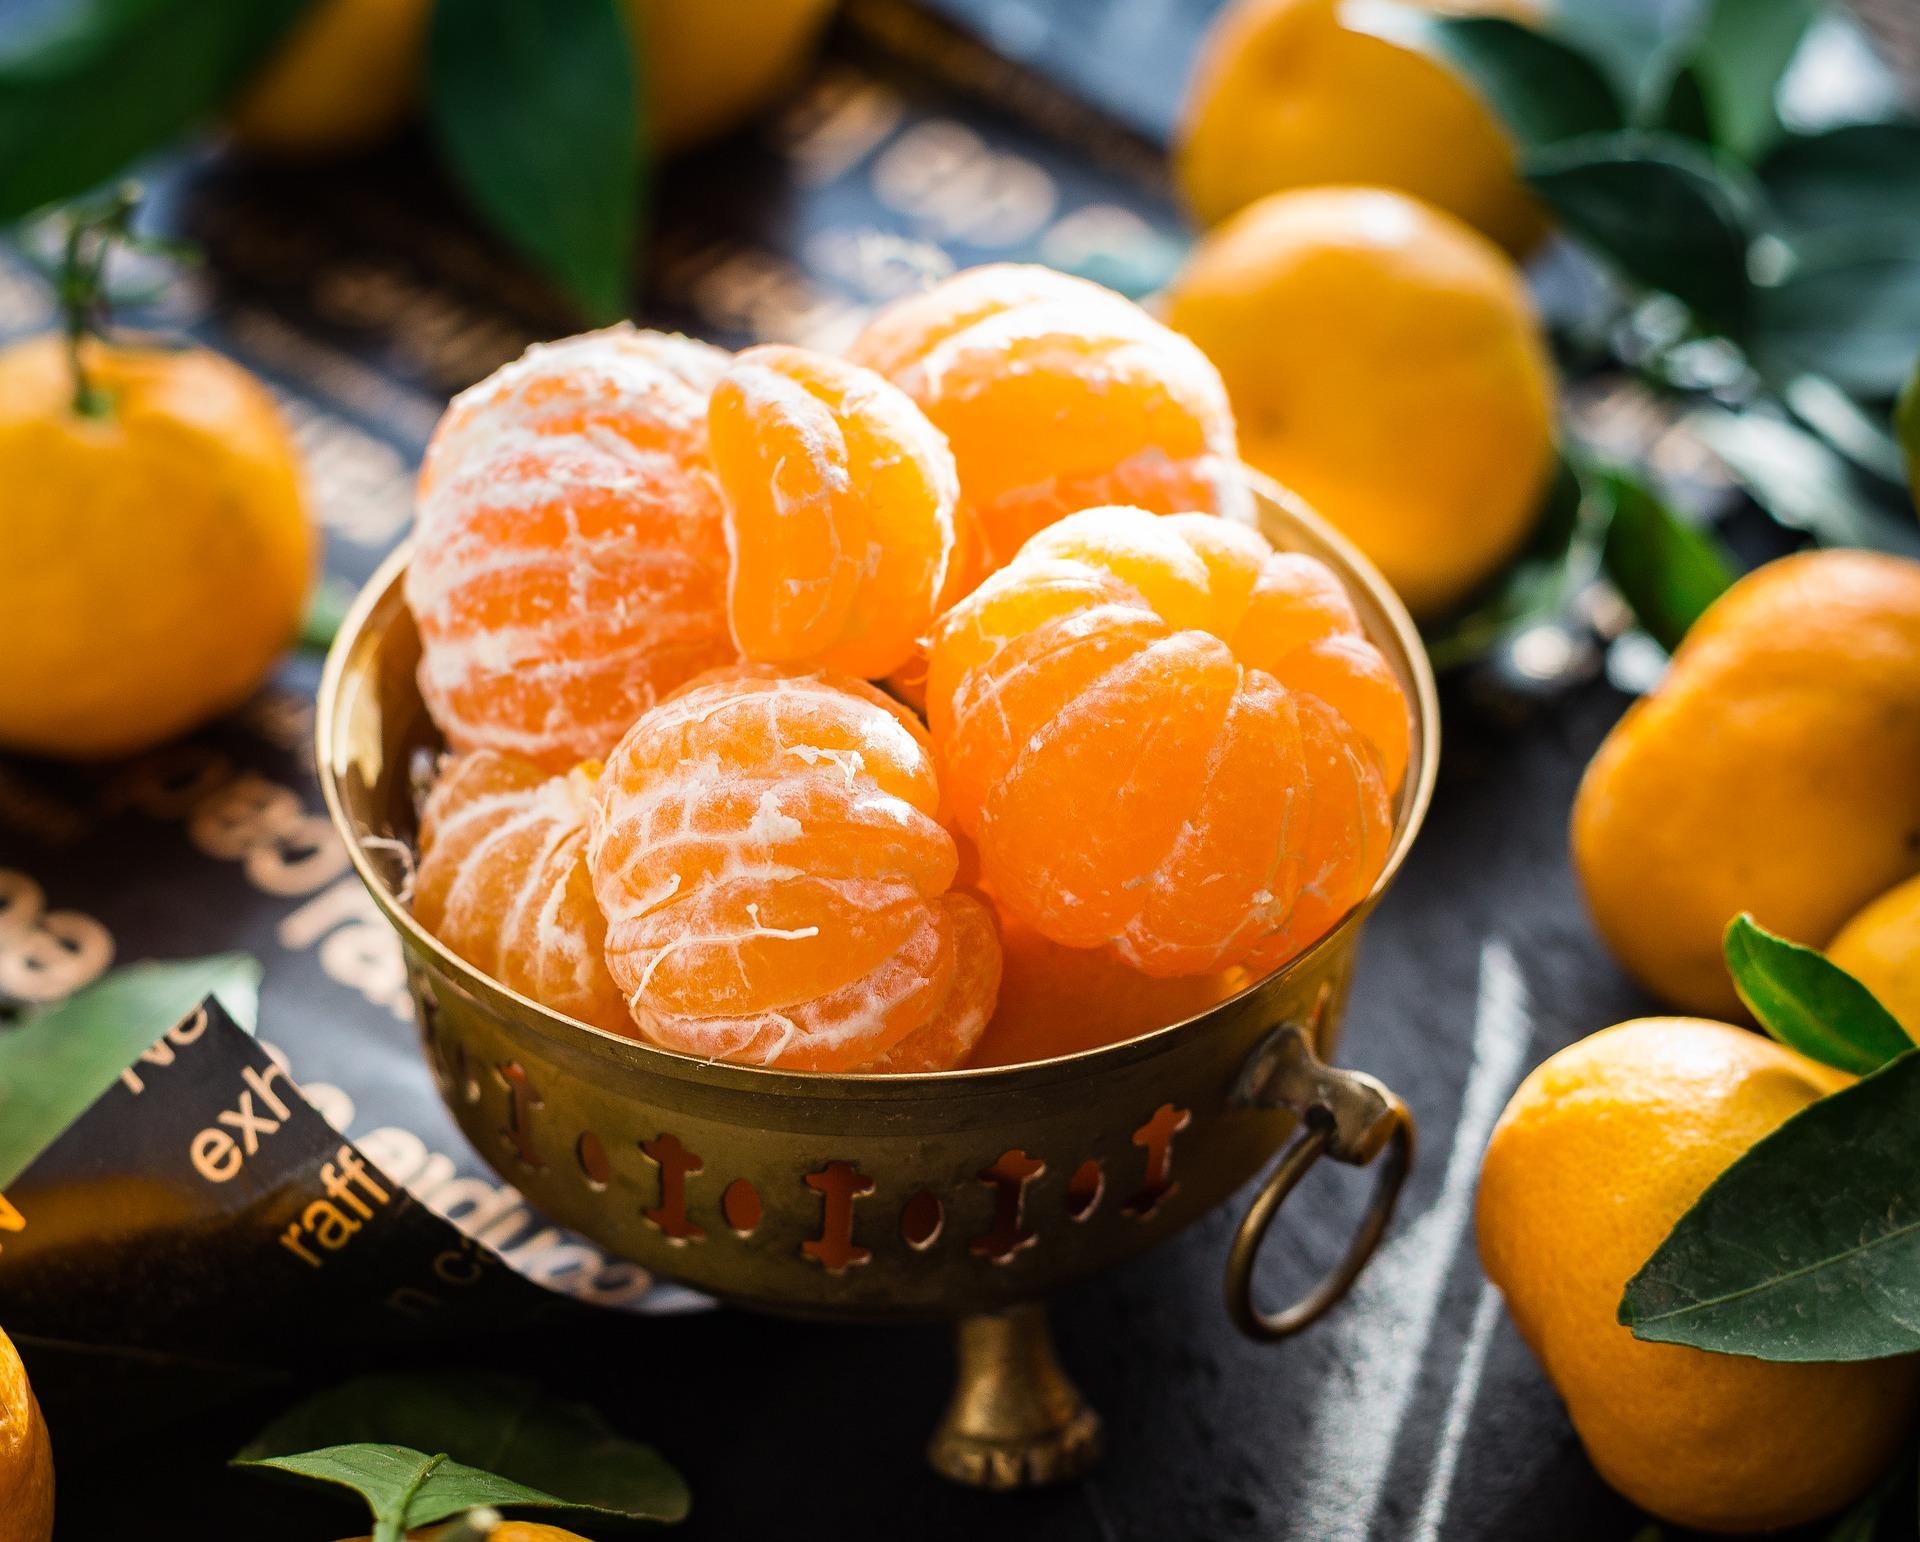 mandarins-2043983_1920.jpg